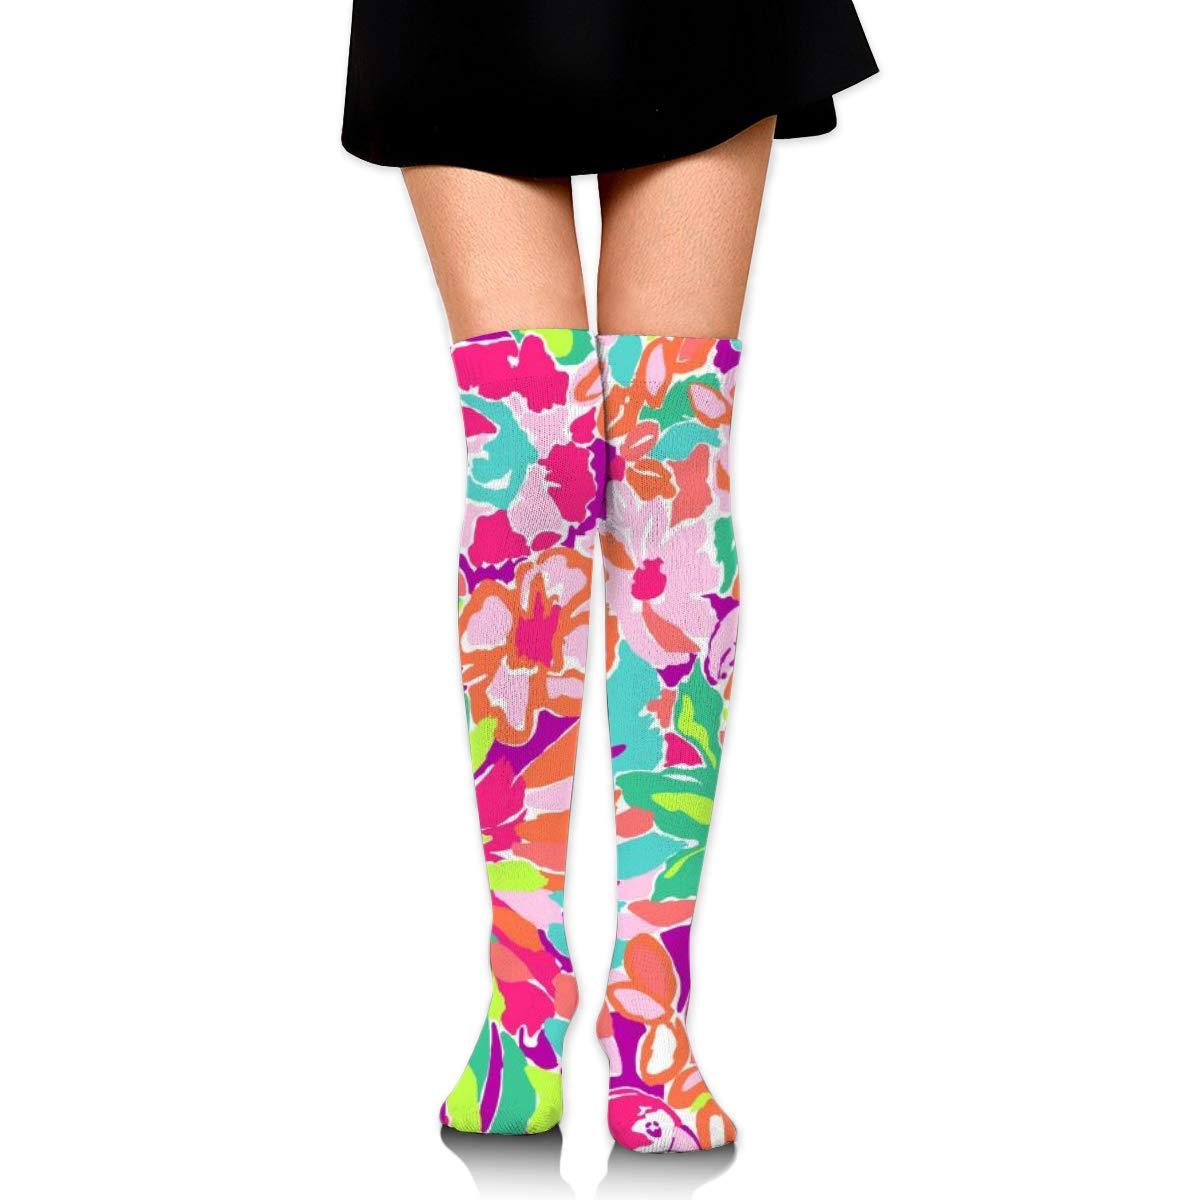 Women Crew Socks Thigh High Knee Flamingo Tropical Florals Long Tube Dress Legging Sport Compression Stocking